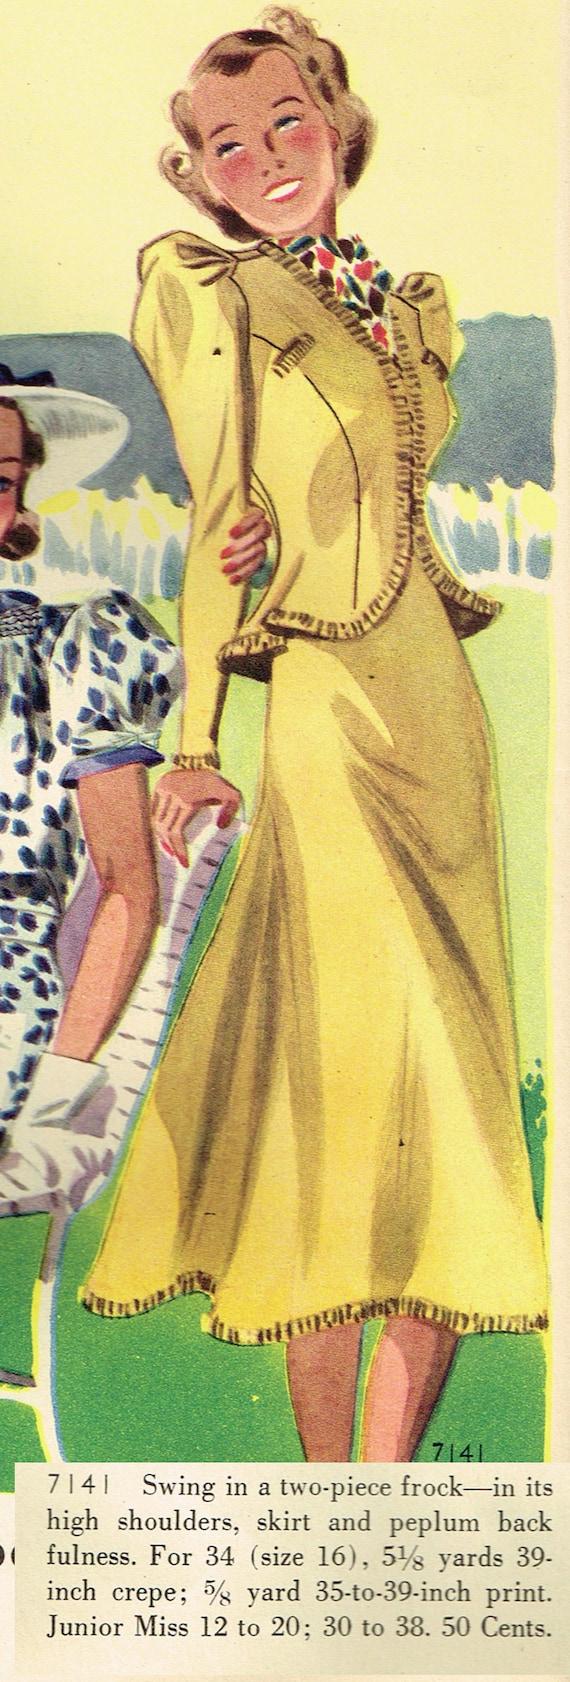 1930s House Dresses 1930s Original Vintage Butterick Pattern 7141 Junior Misses 2 PC Dress Size 33 B1930s Original Vintage Butterick Pattern 7141 Junior Misses 2 PC Dress Size 33 B  AT vintagedancer.com